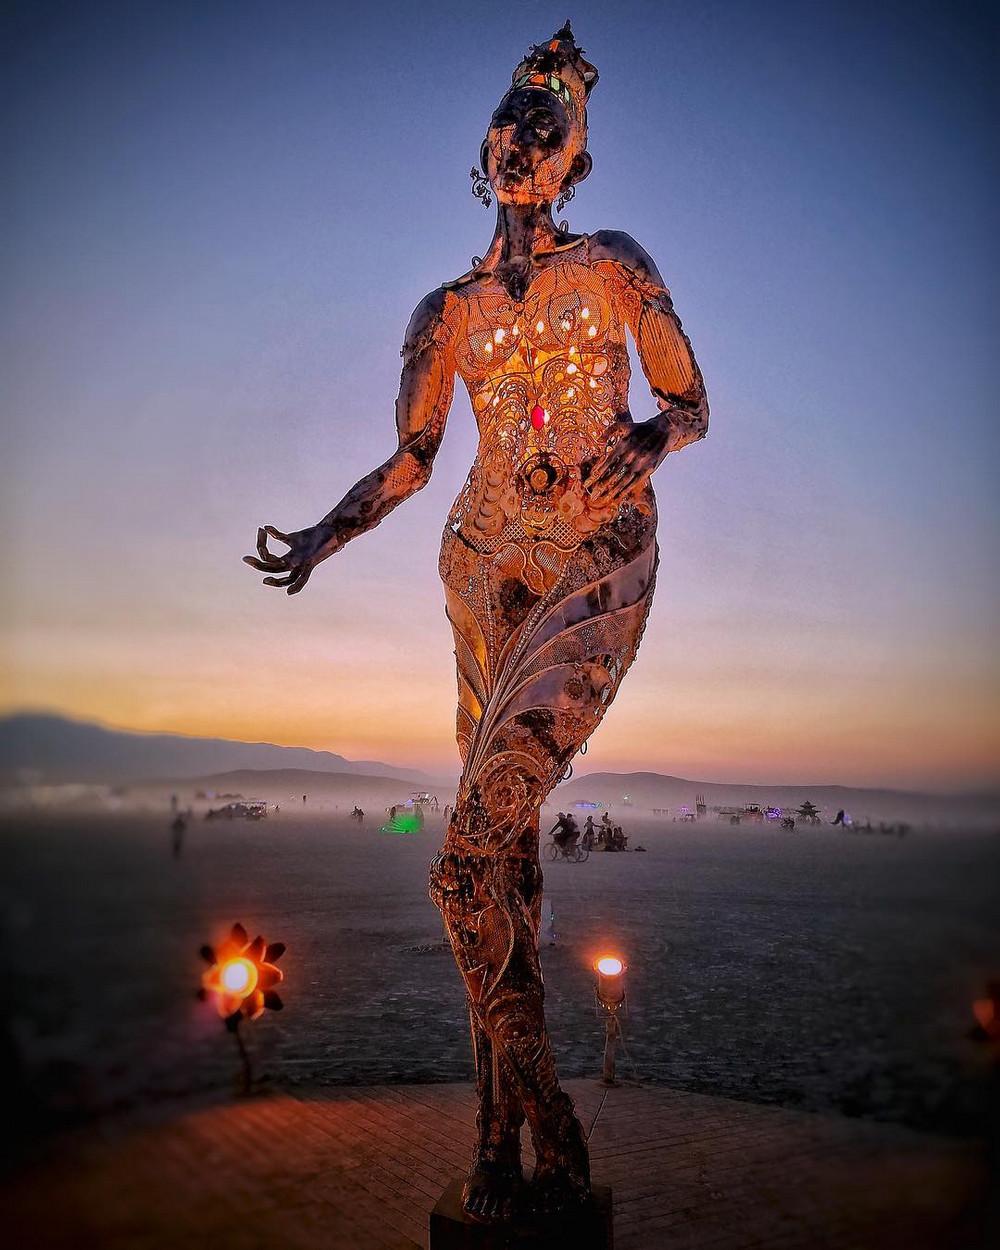 Фотоотчет с фестиваля Burning Man 2018